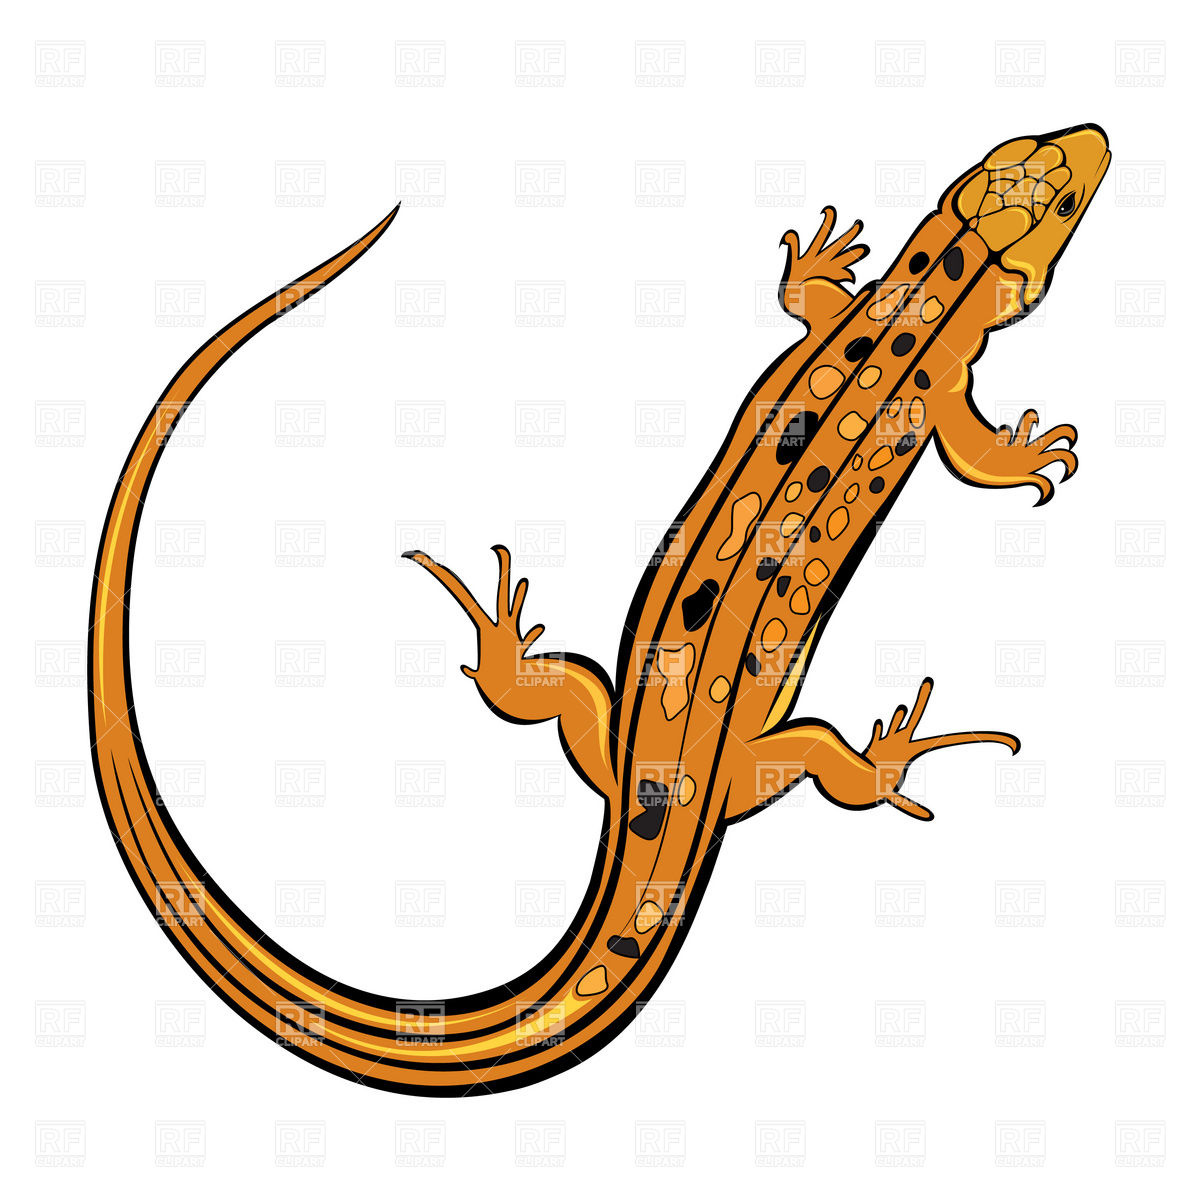 Lizard clipart #1, Download drawings